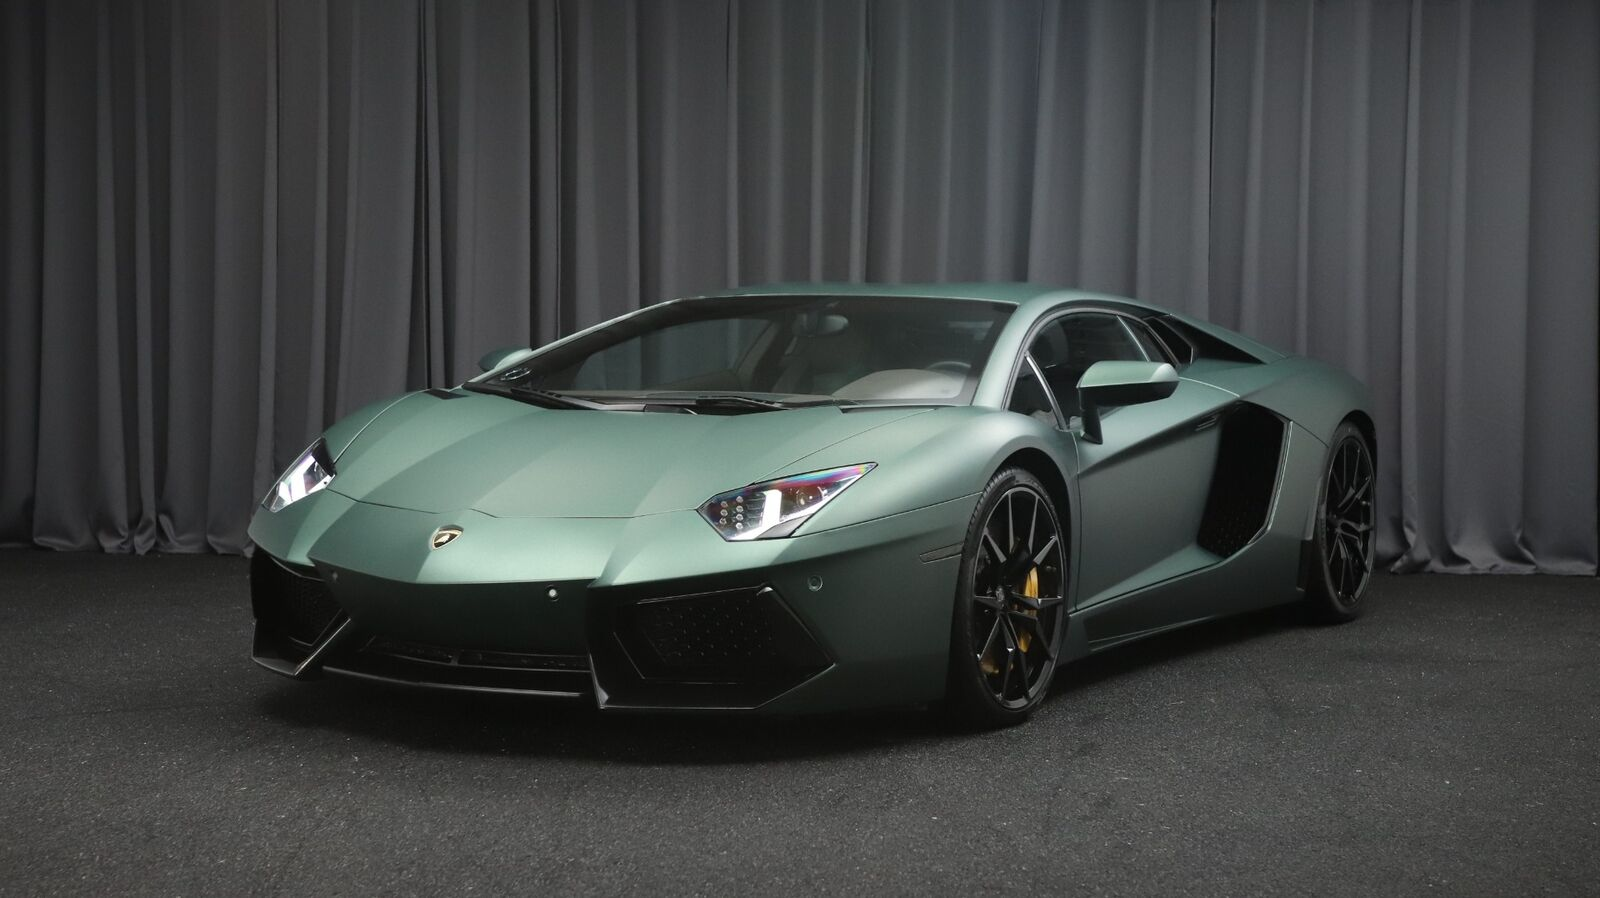 Lamborghini Aventador 6,5 LP 700-4 2d